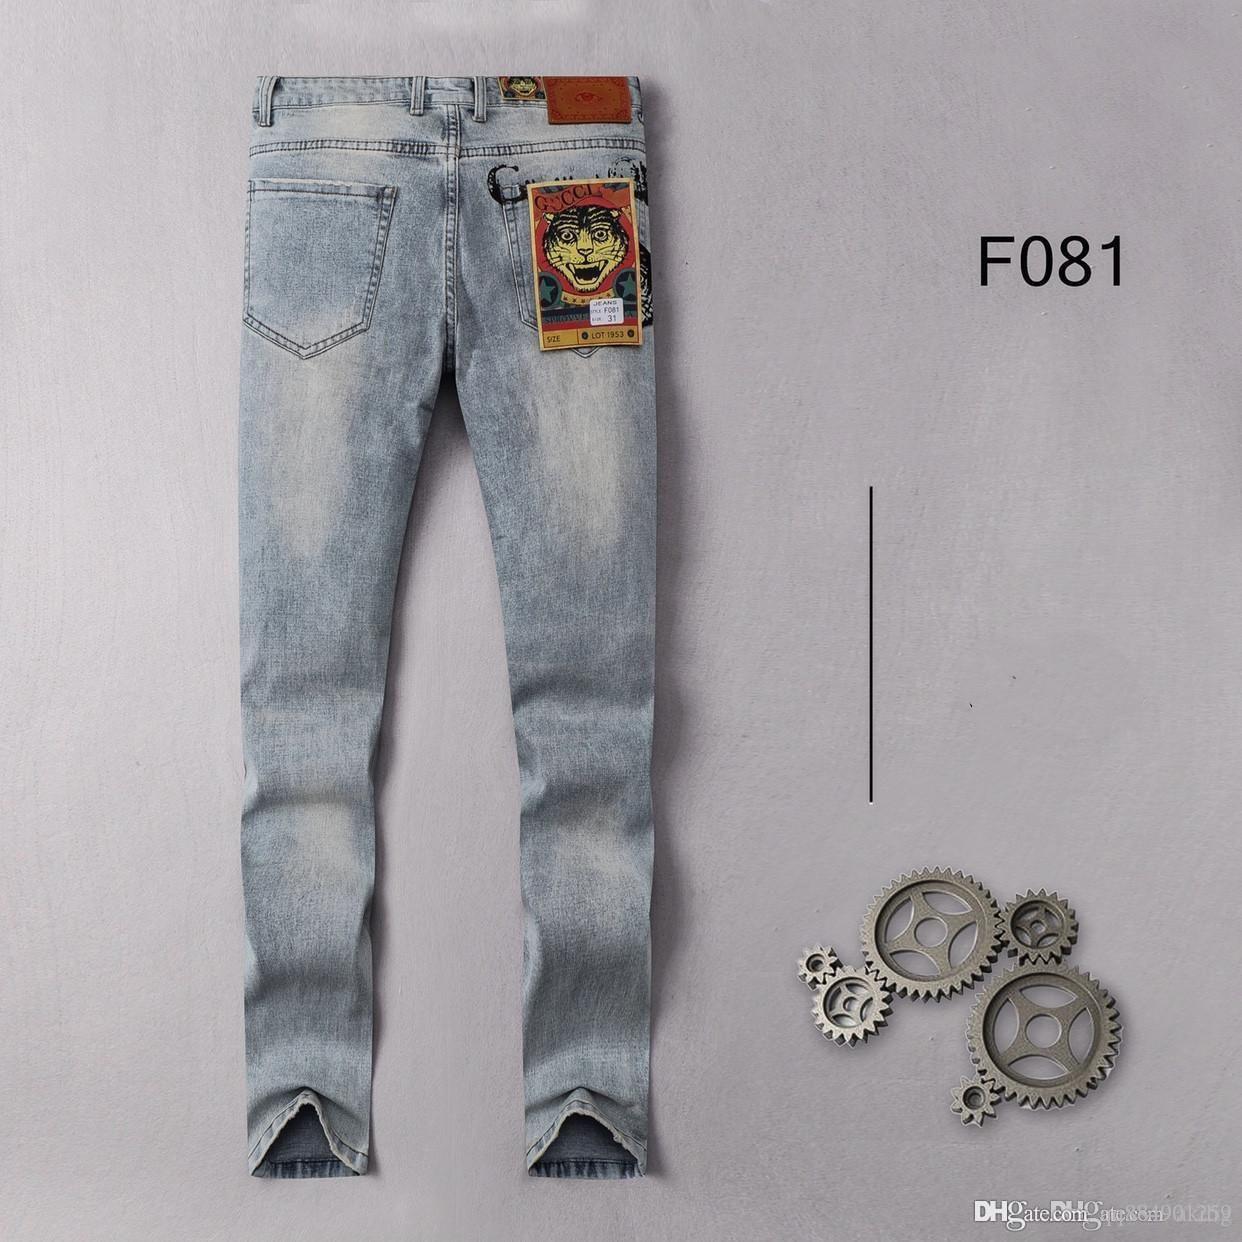 2020 Autumn Explosion Jeans Men's Fashion Embroidery Casual Slim Blue Stretch Pants Men's Pants Size 29-38 Men's Jeans Relaxe